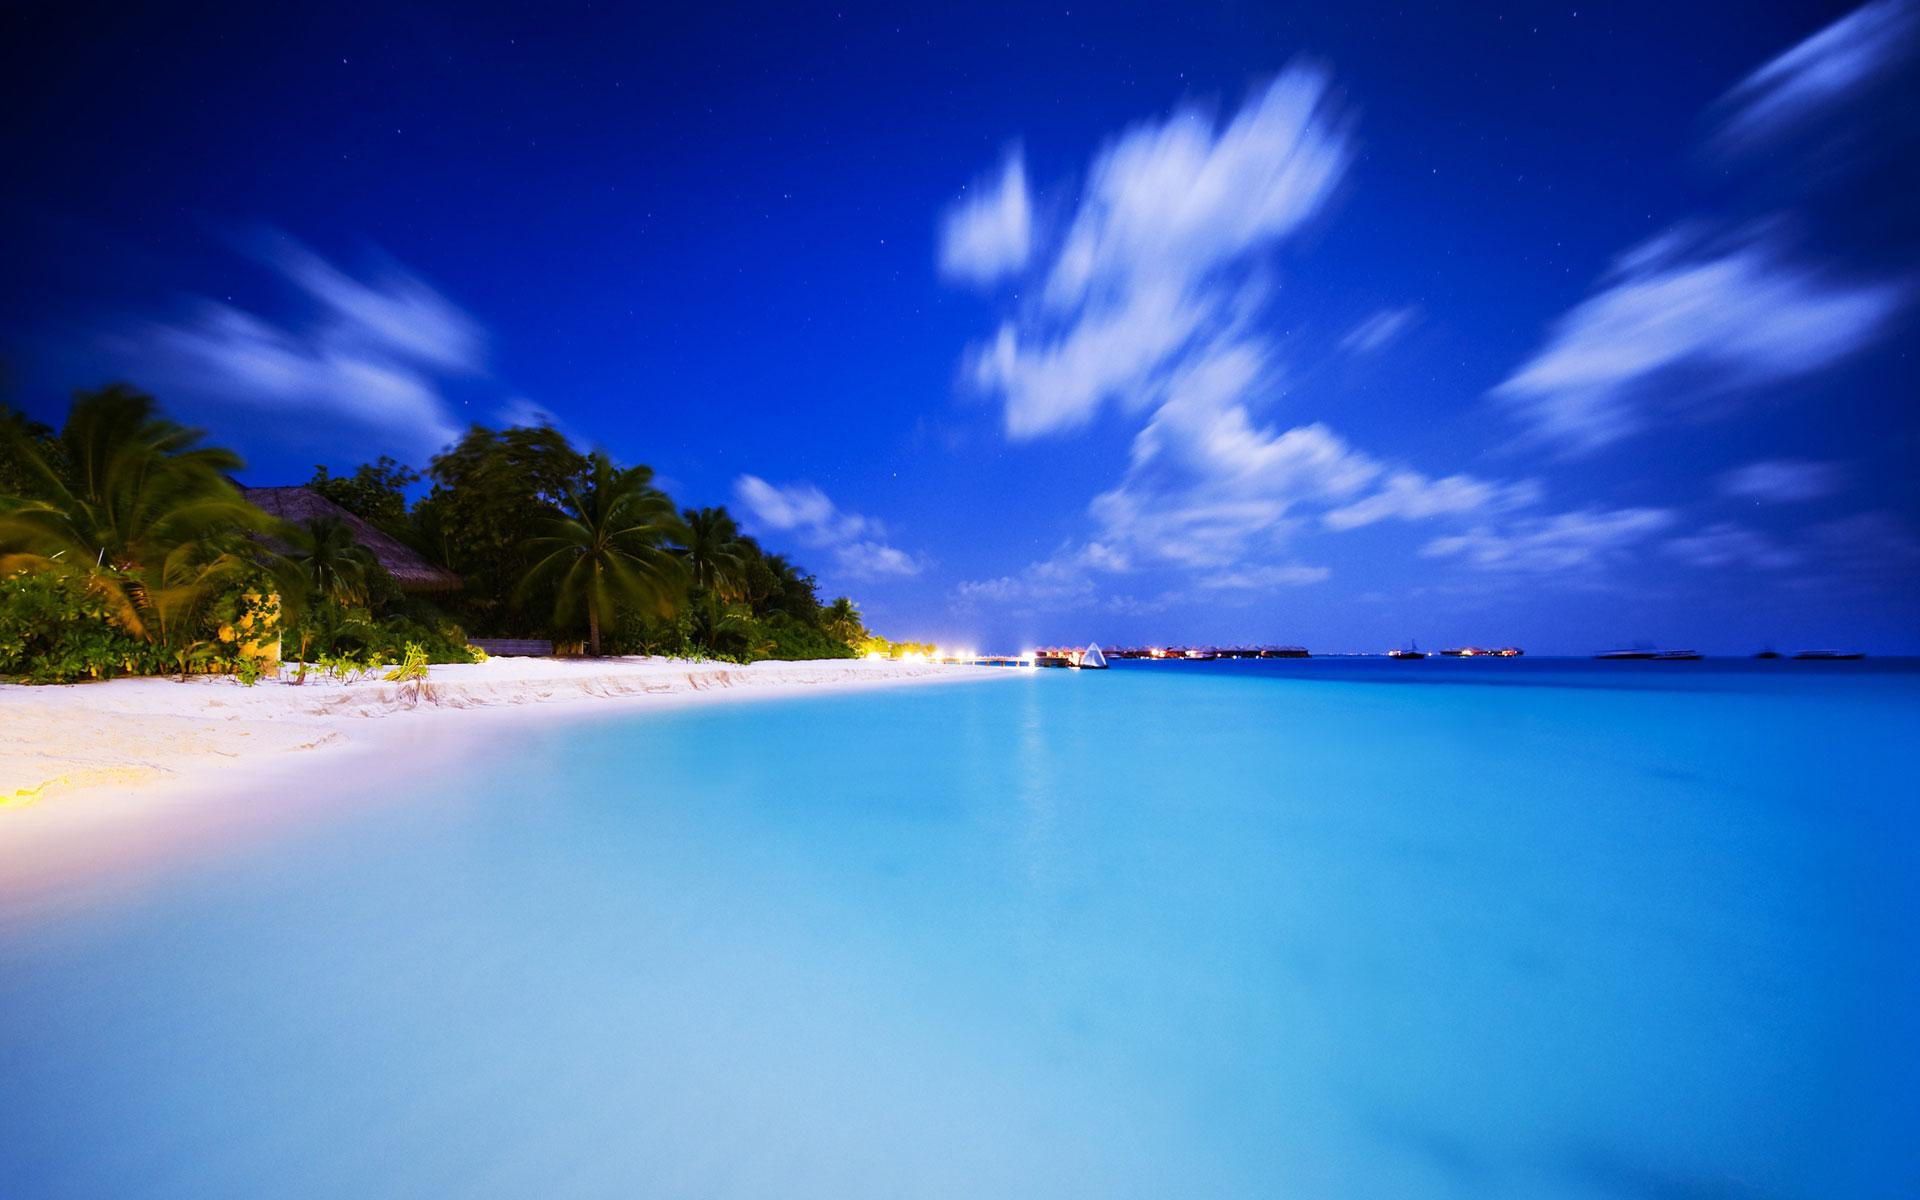 Tropical Island Wallpaper | Live HD Wallpaper HQ Pictures ...